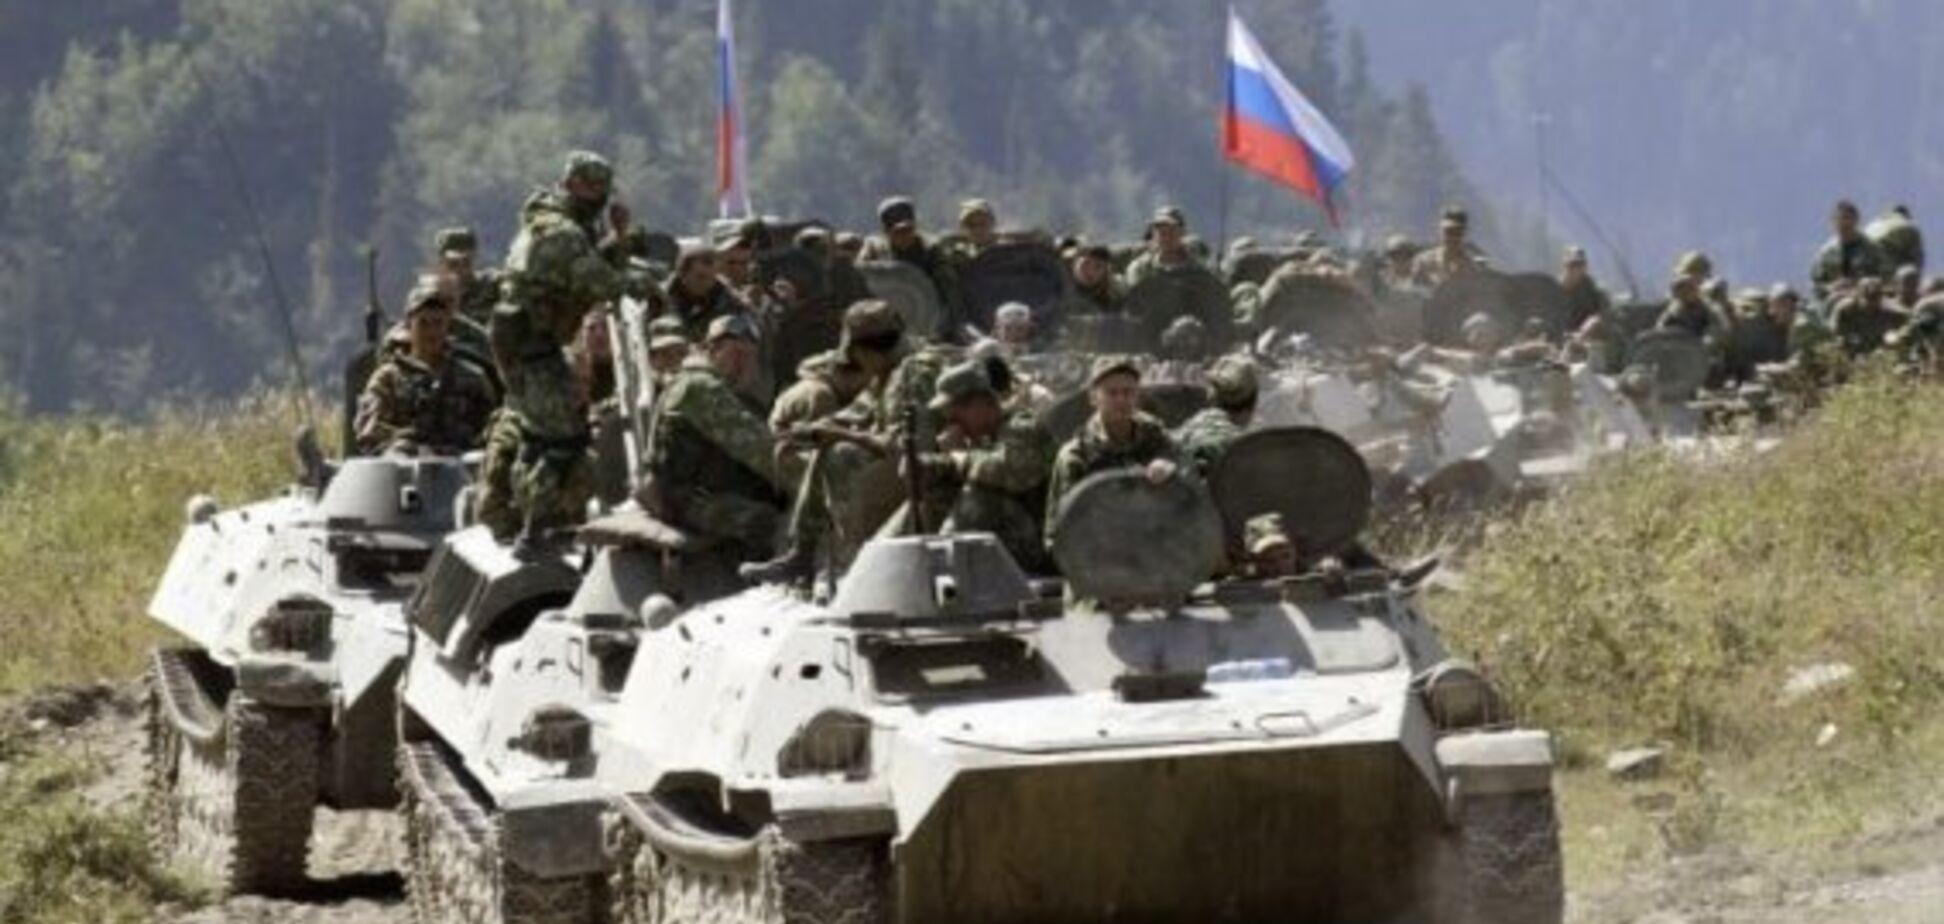 Як в 2014-му: Україну попередили про напад РФ